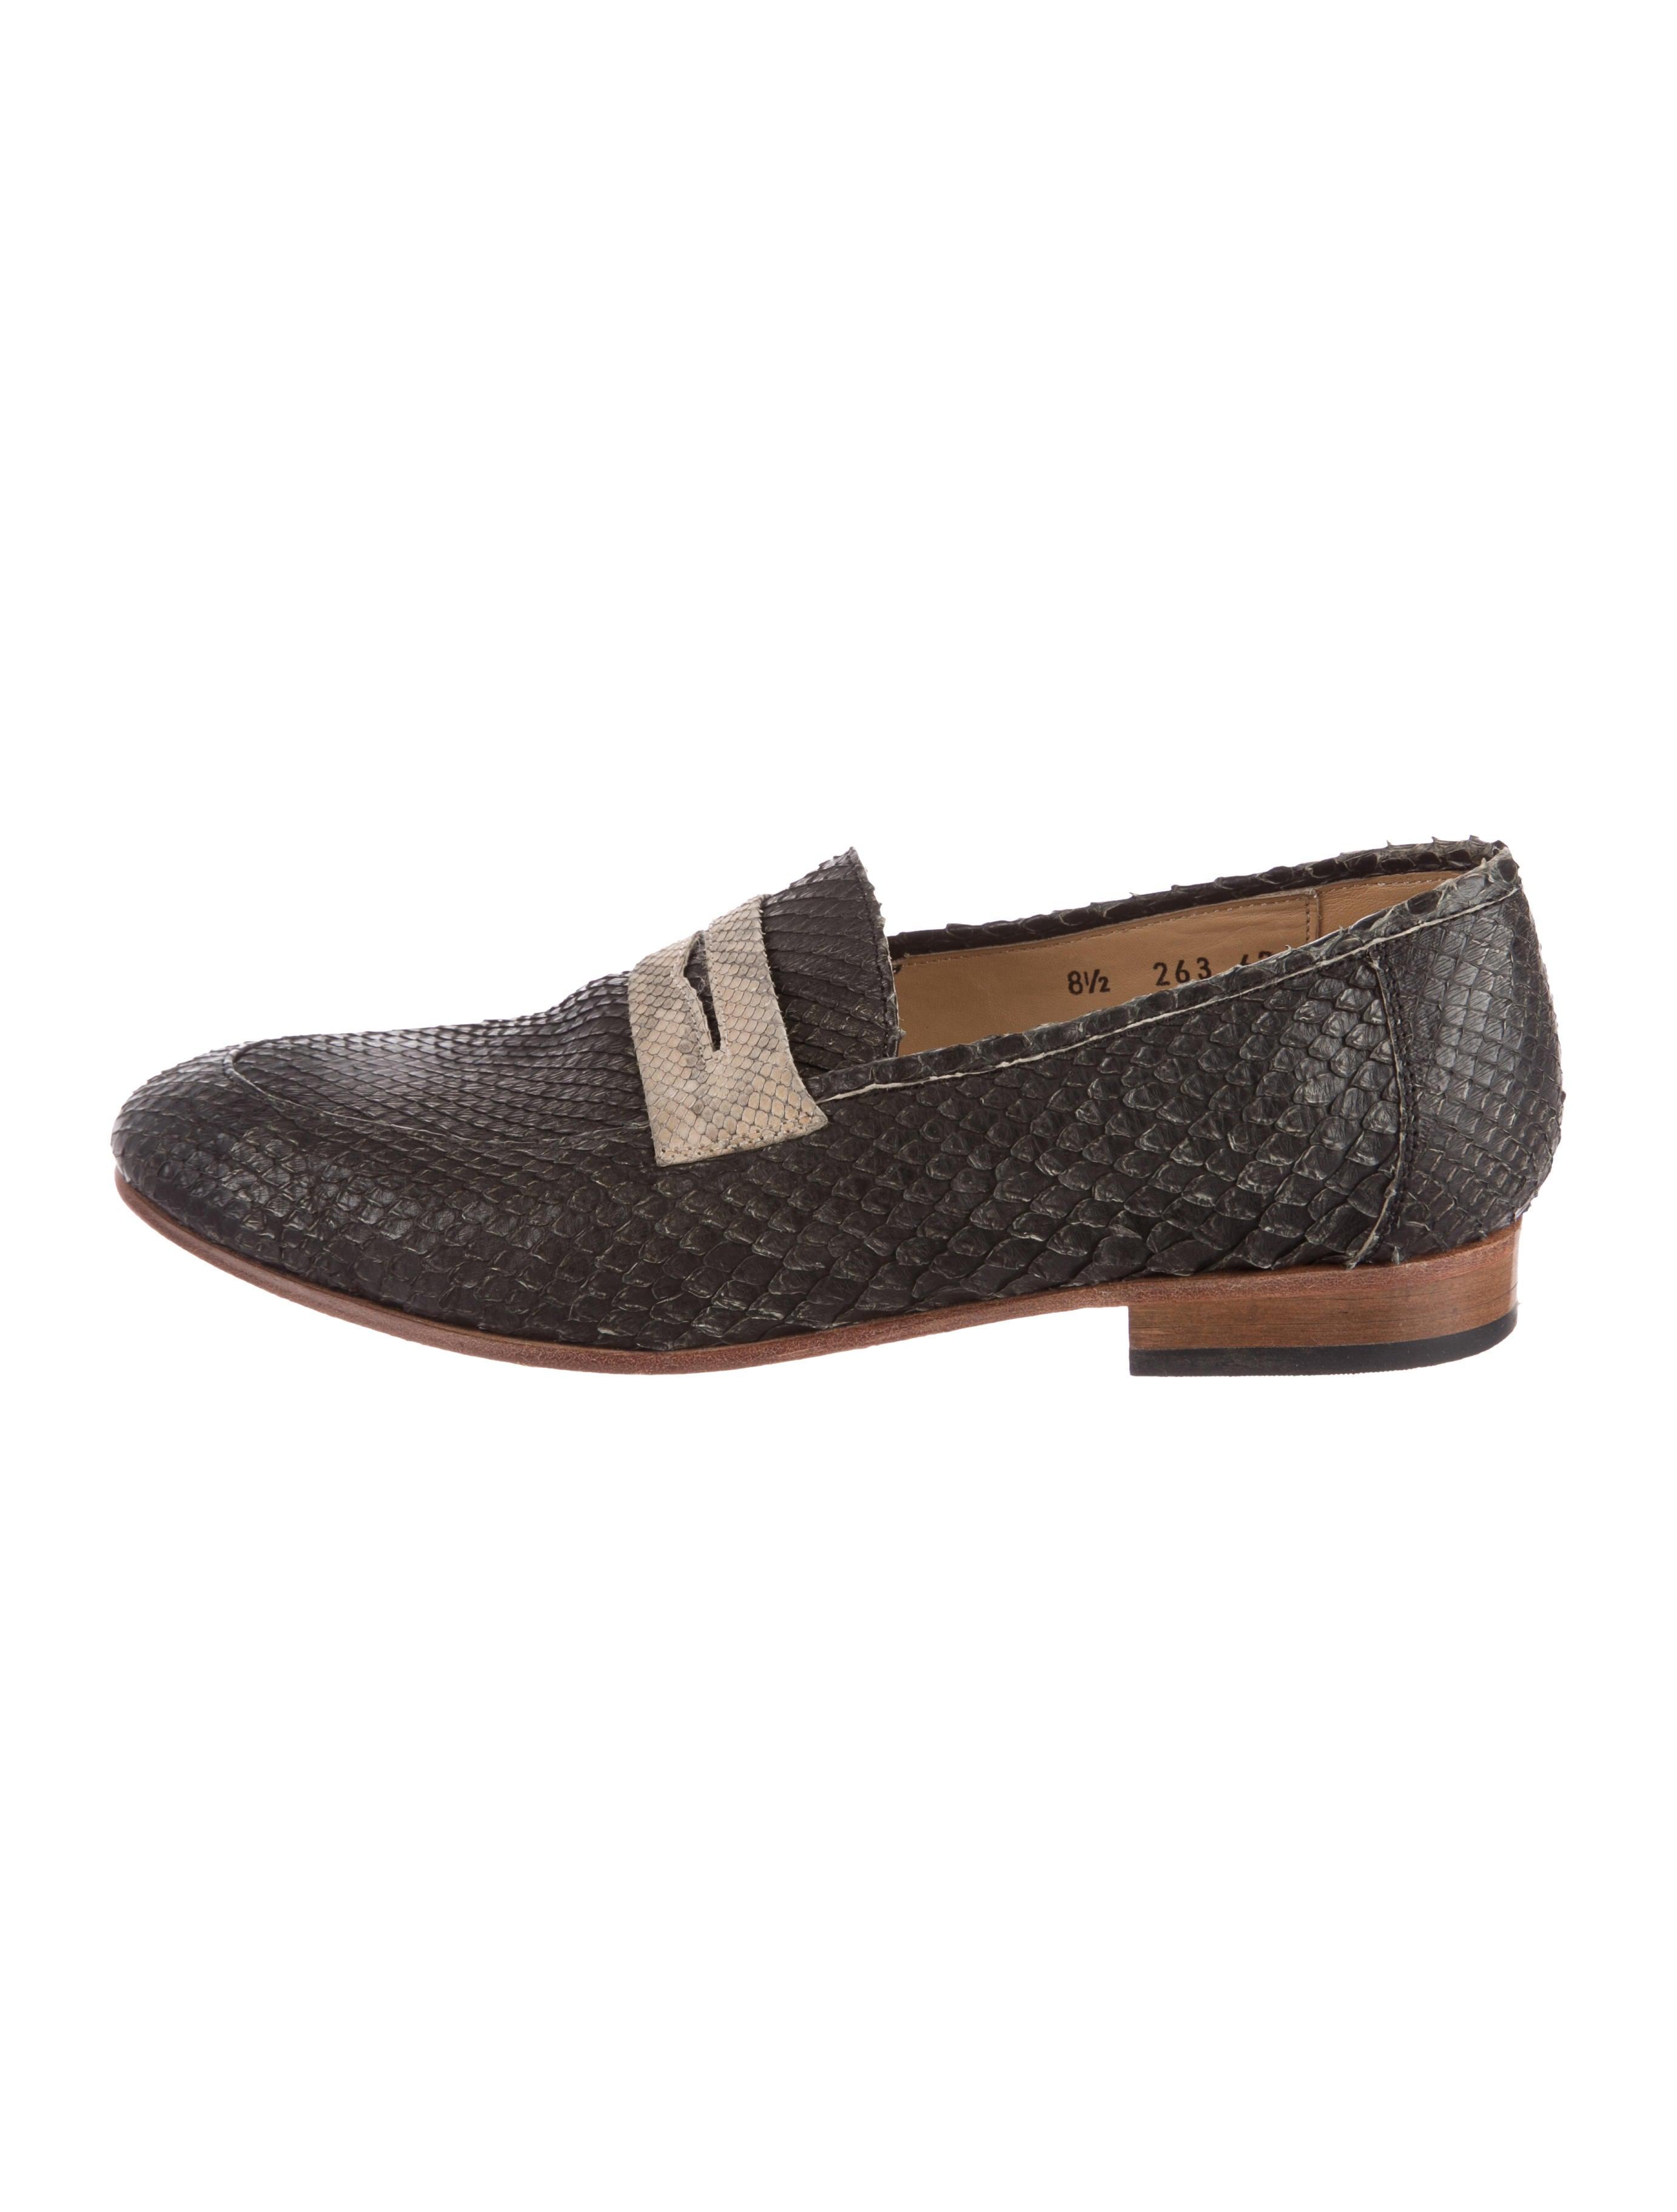 many kinds of cheap online Dieppa Restrepo Snakeskin Round-Toe Loafers cheap official cheap sale nicekicks ZVShBm